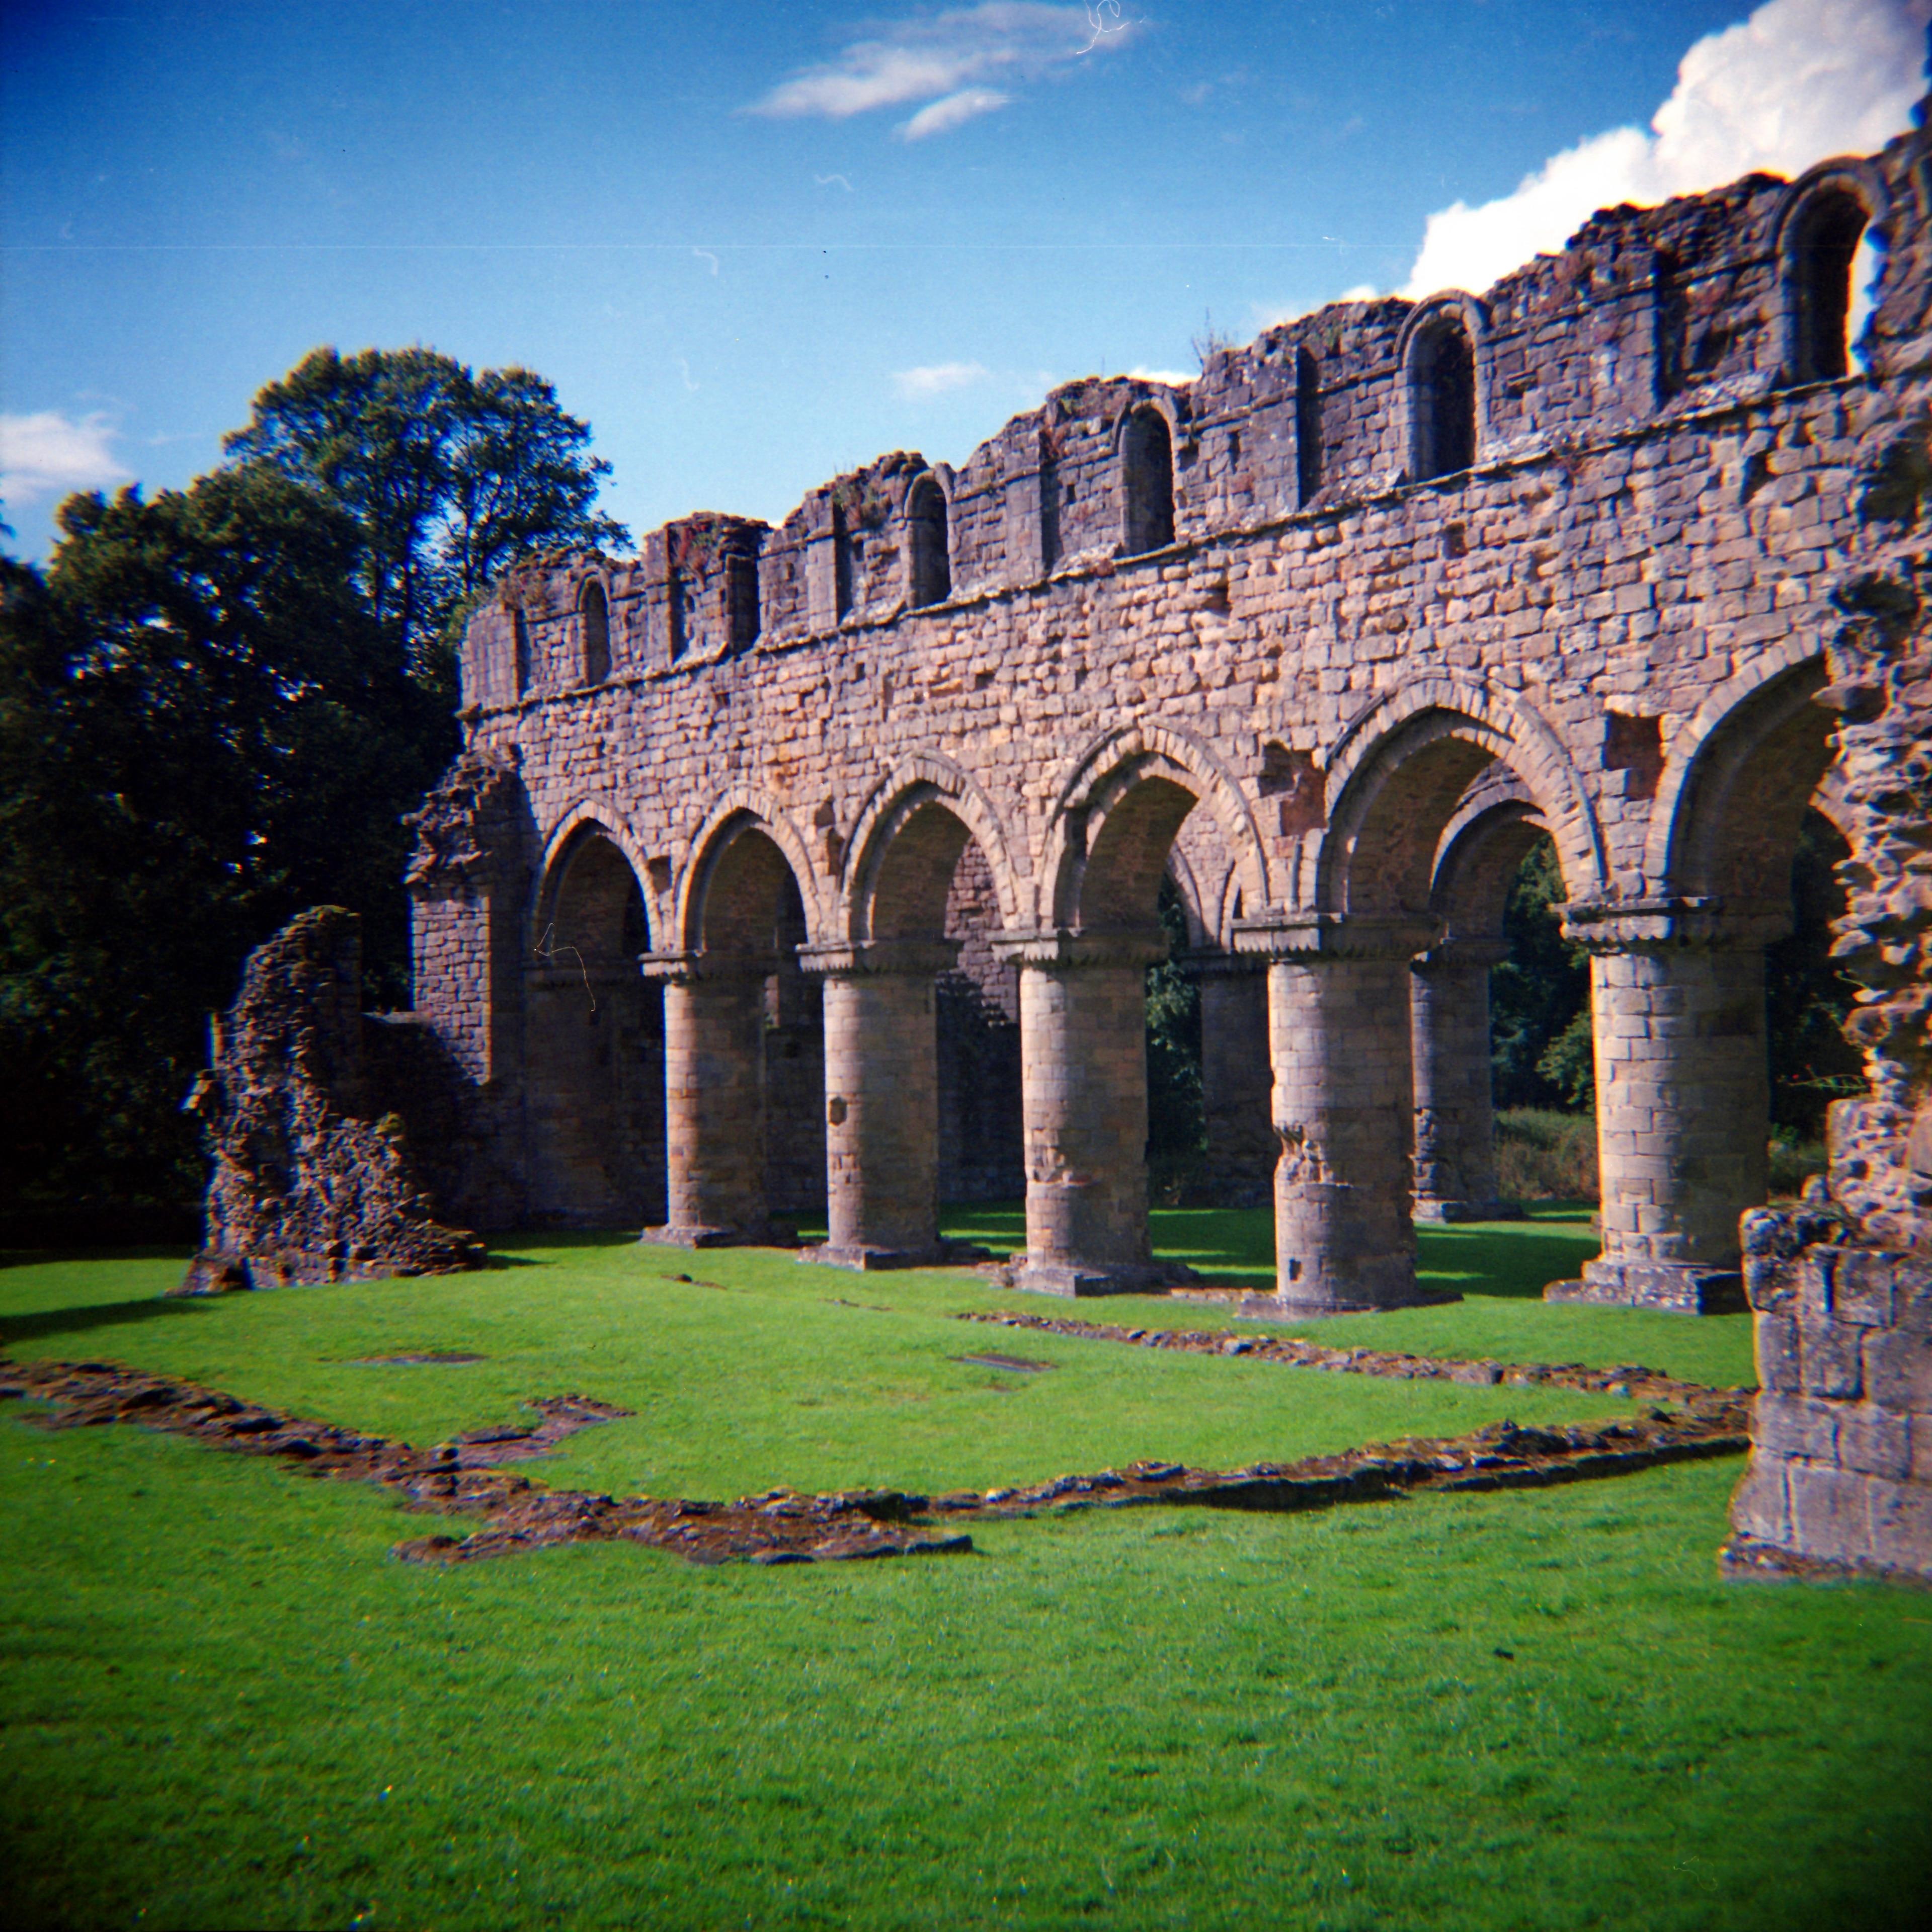 Buildwas Abbey, Telford, England, Großbritannien